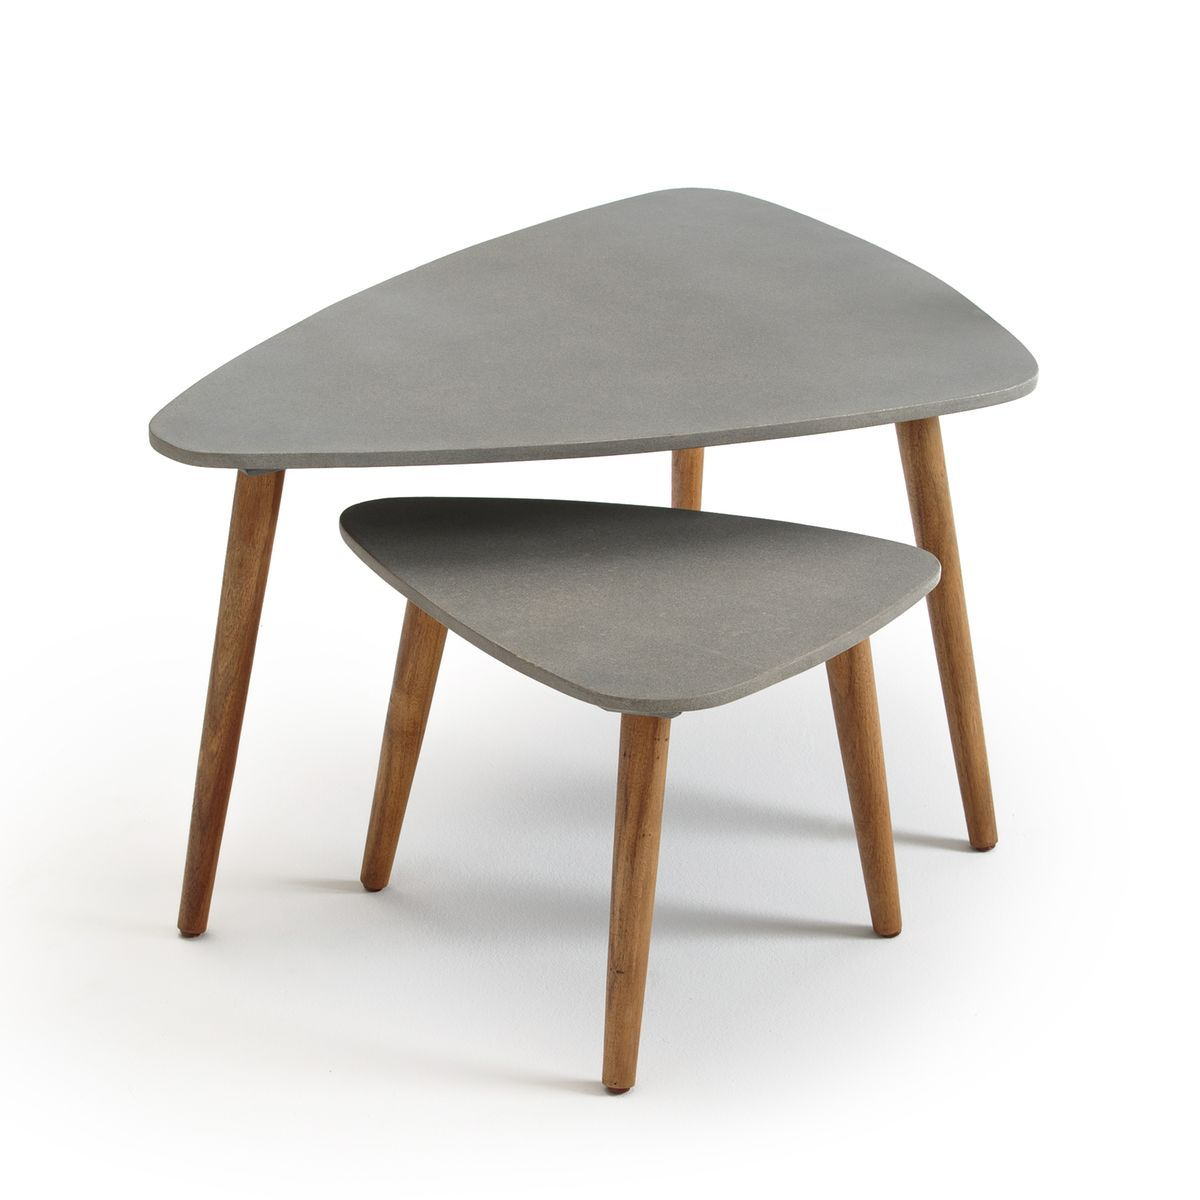 Table Basse De Jardin Gigogne, Julma, Lot De 2 - Taille ... serapportantà Table Basse De Jardin Ikea